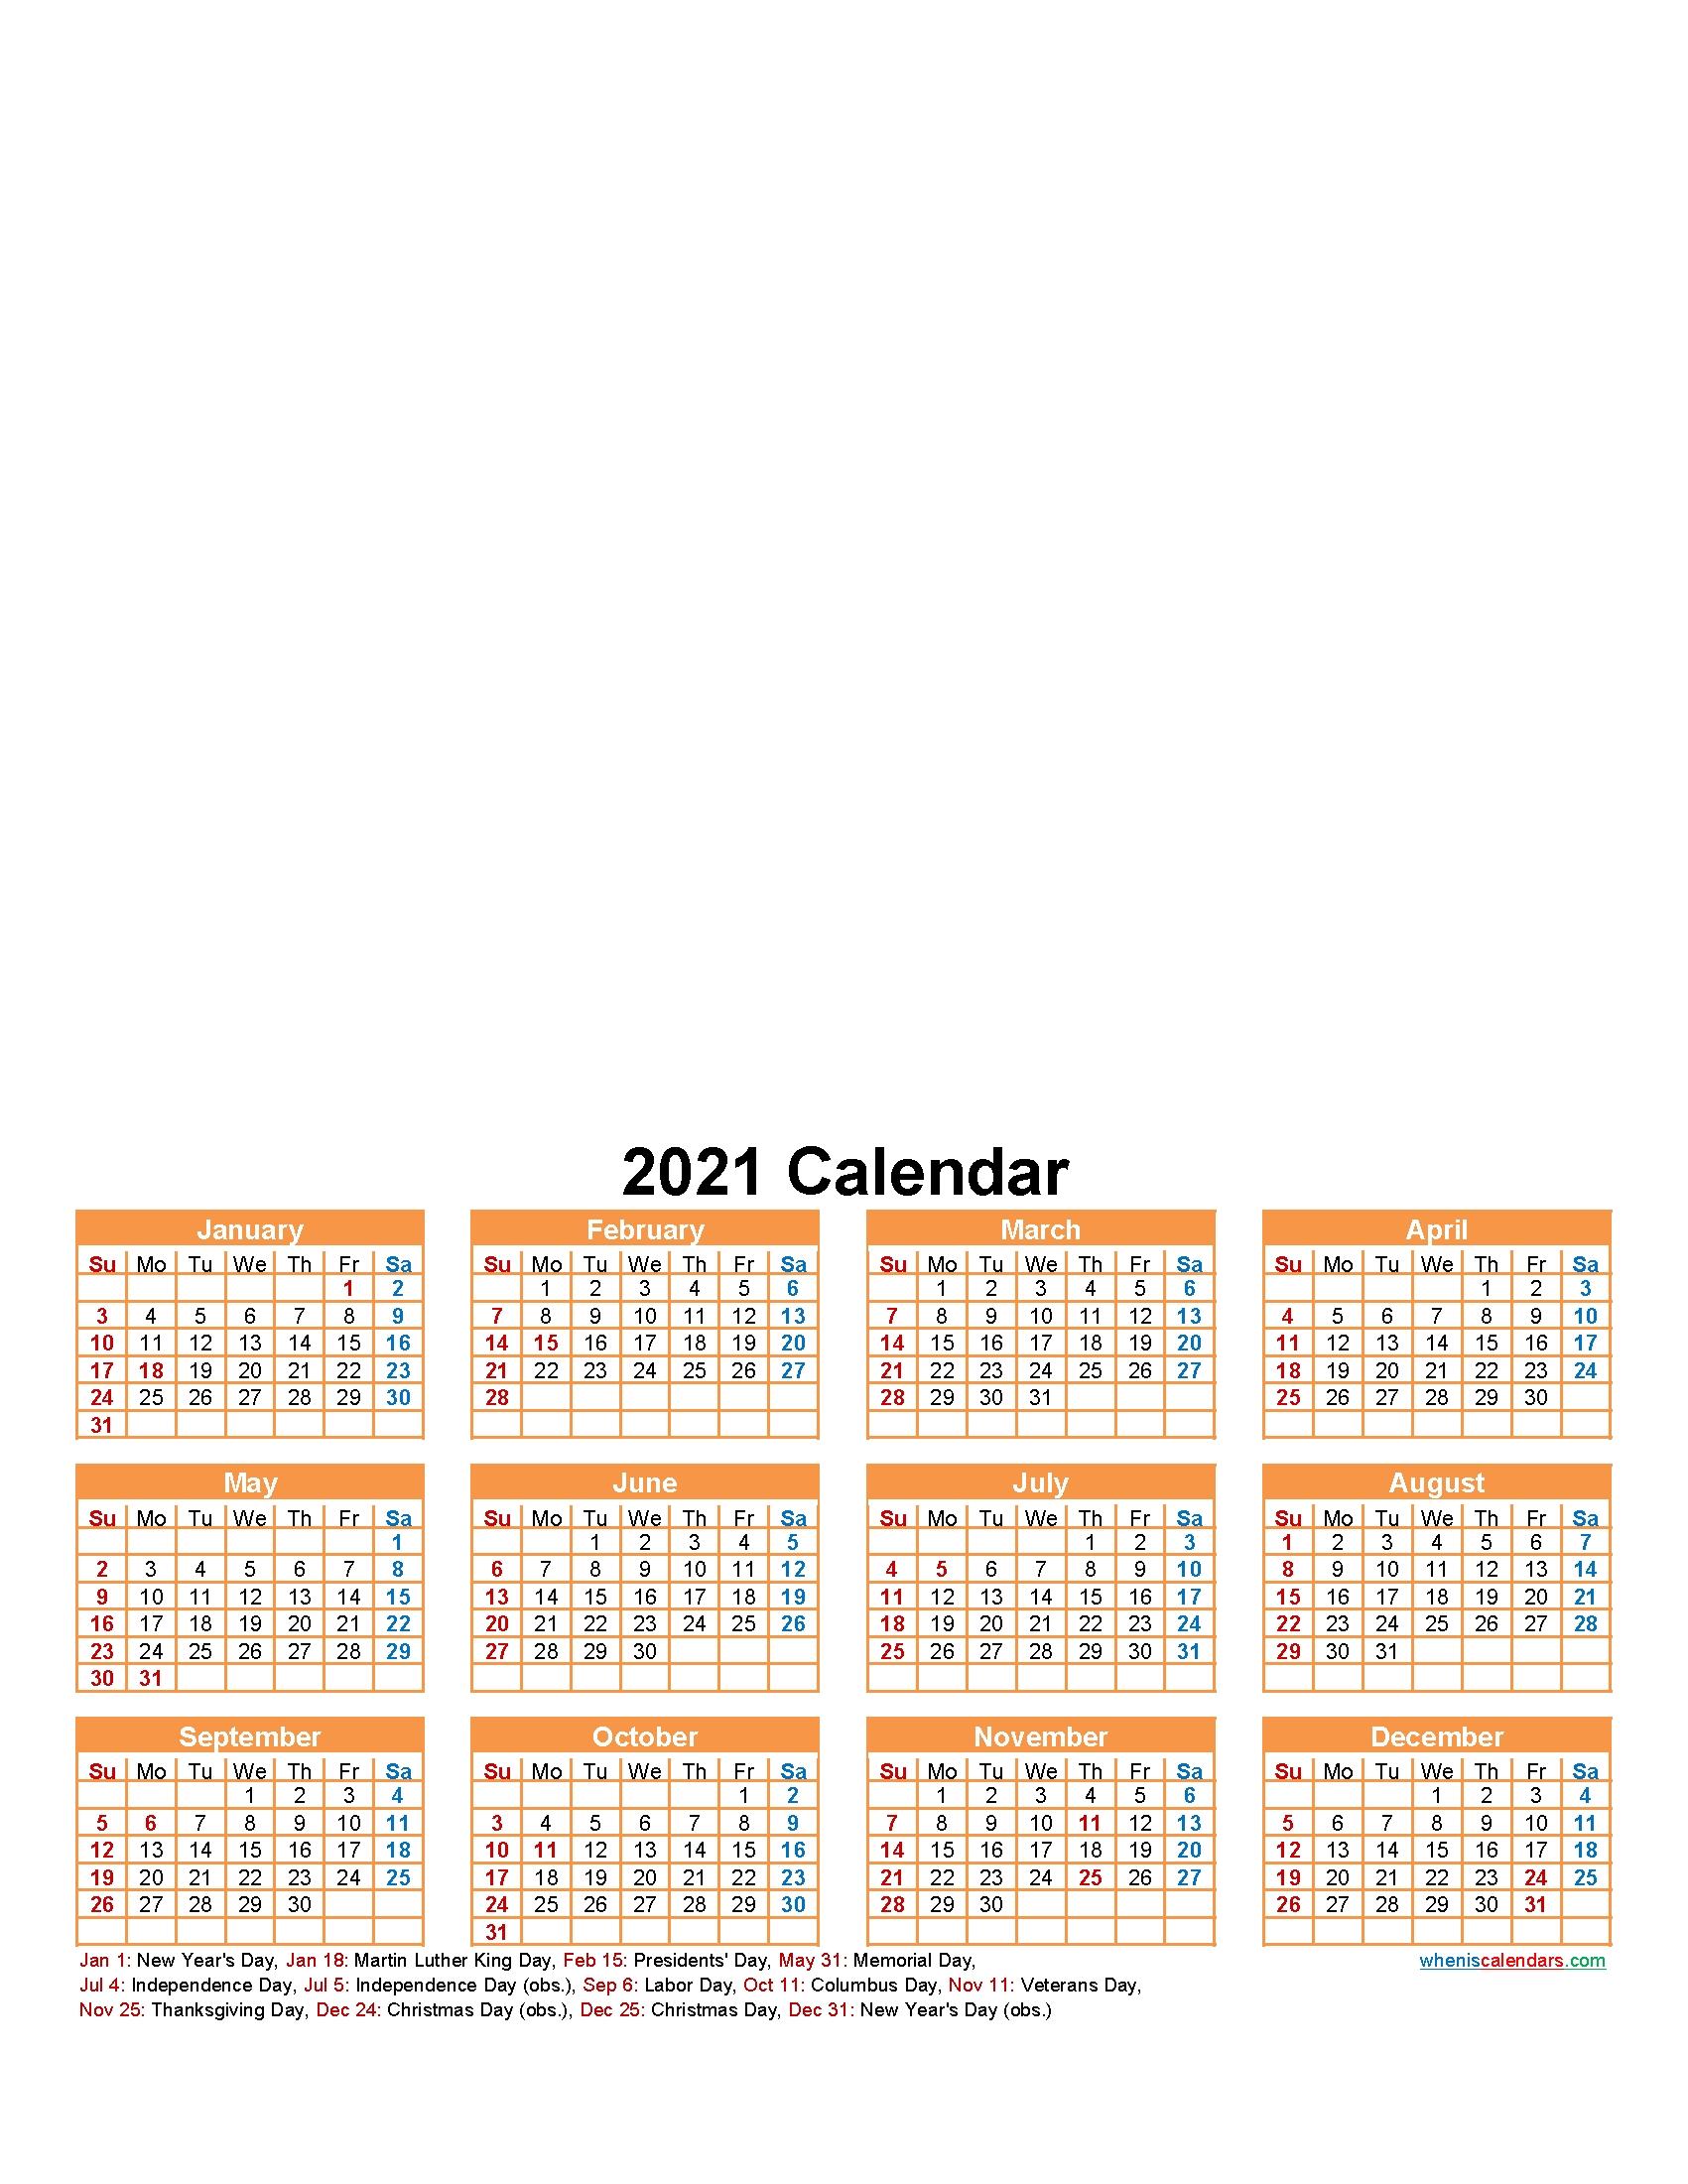 Create Your Own Photo Calendar Online Free 2021 - Template-Online Calendar 2021